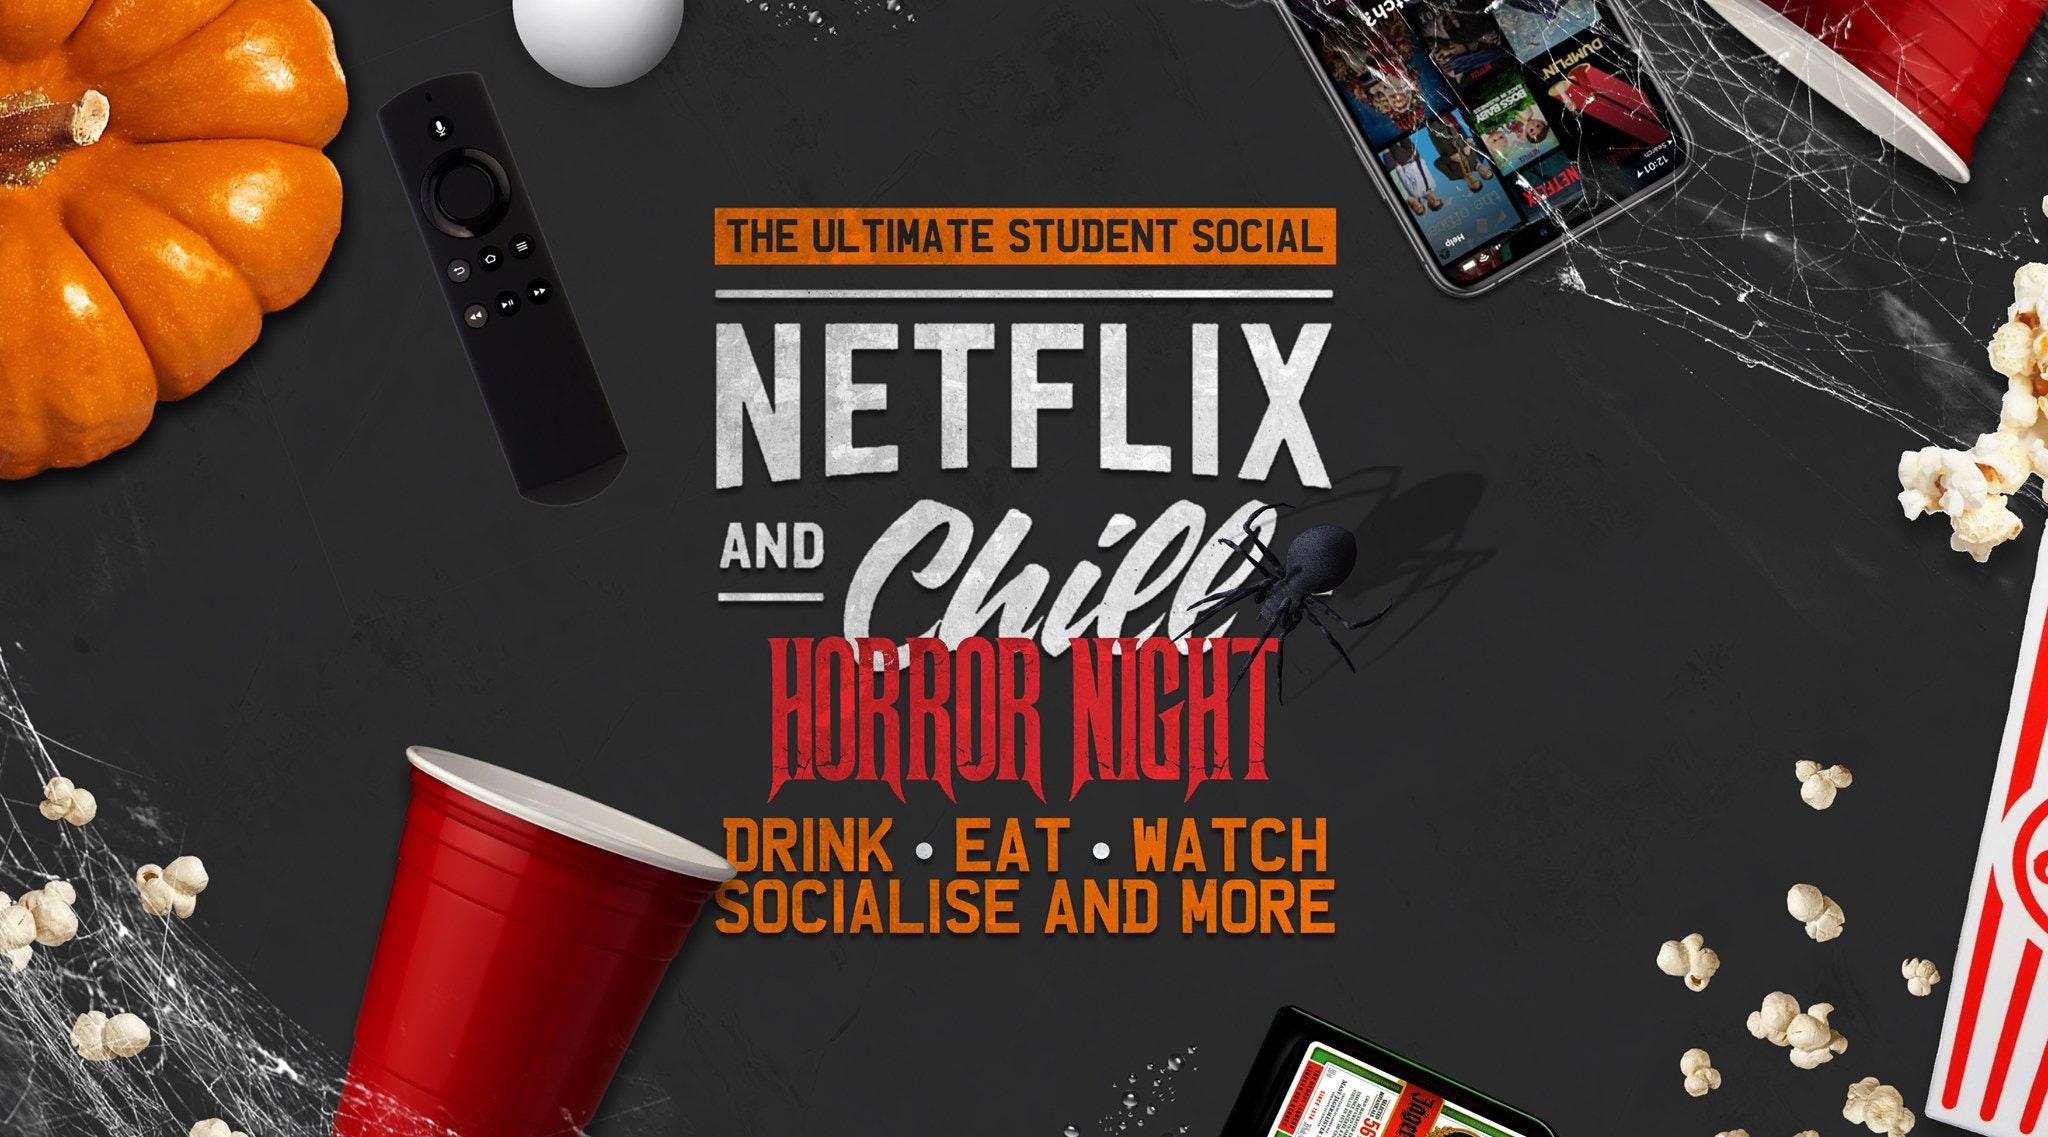 Netflix & Chill 👀 HORROR NIGHT  🎃The Ultimate Spooky Socia l 🎉